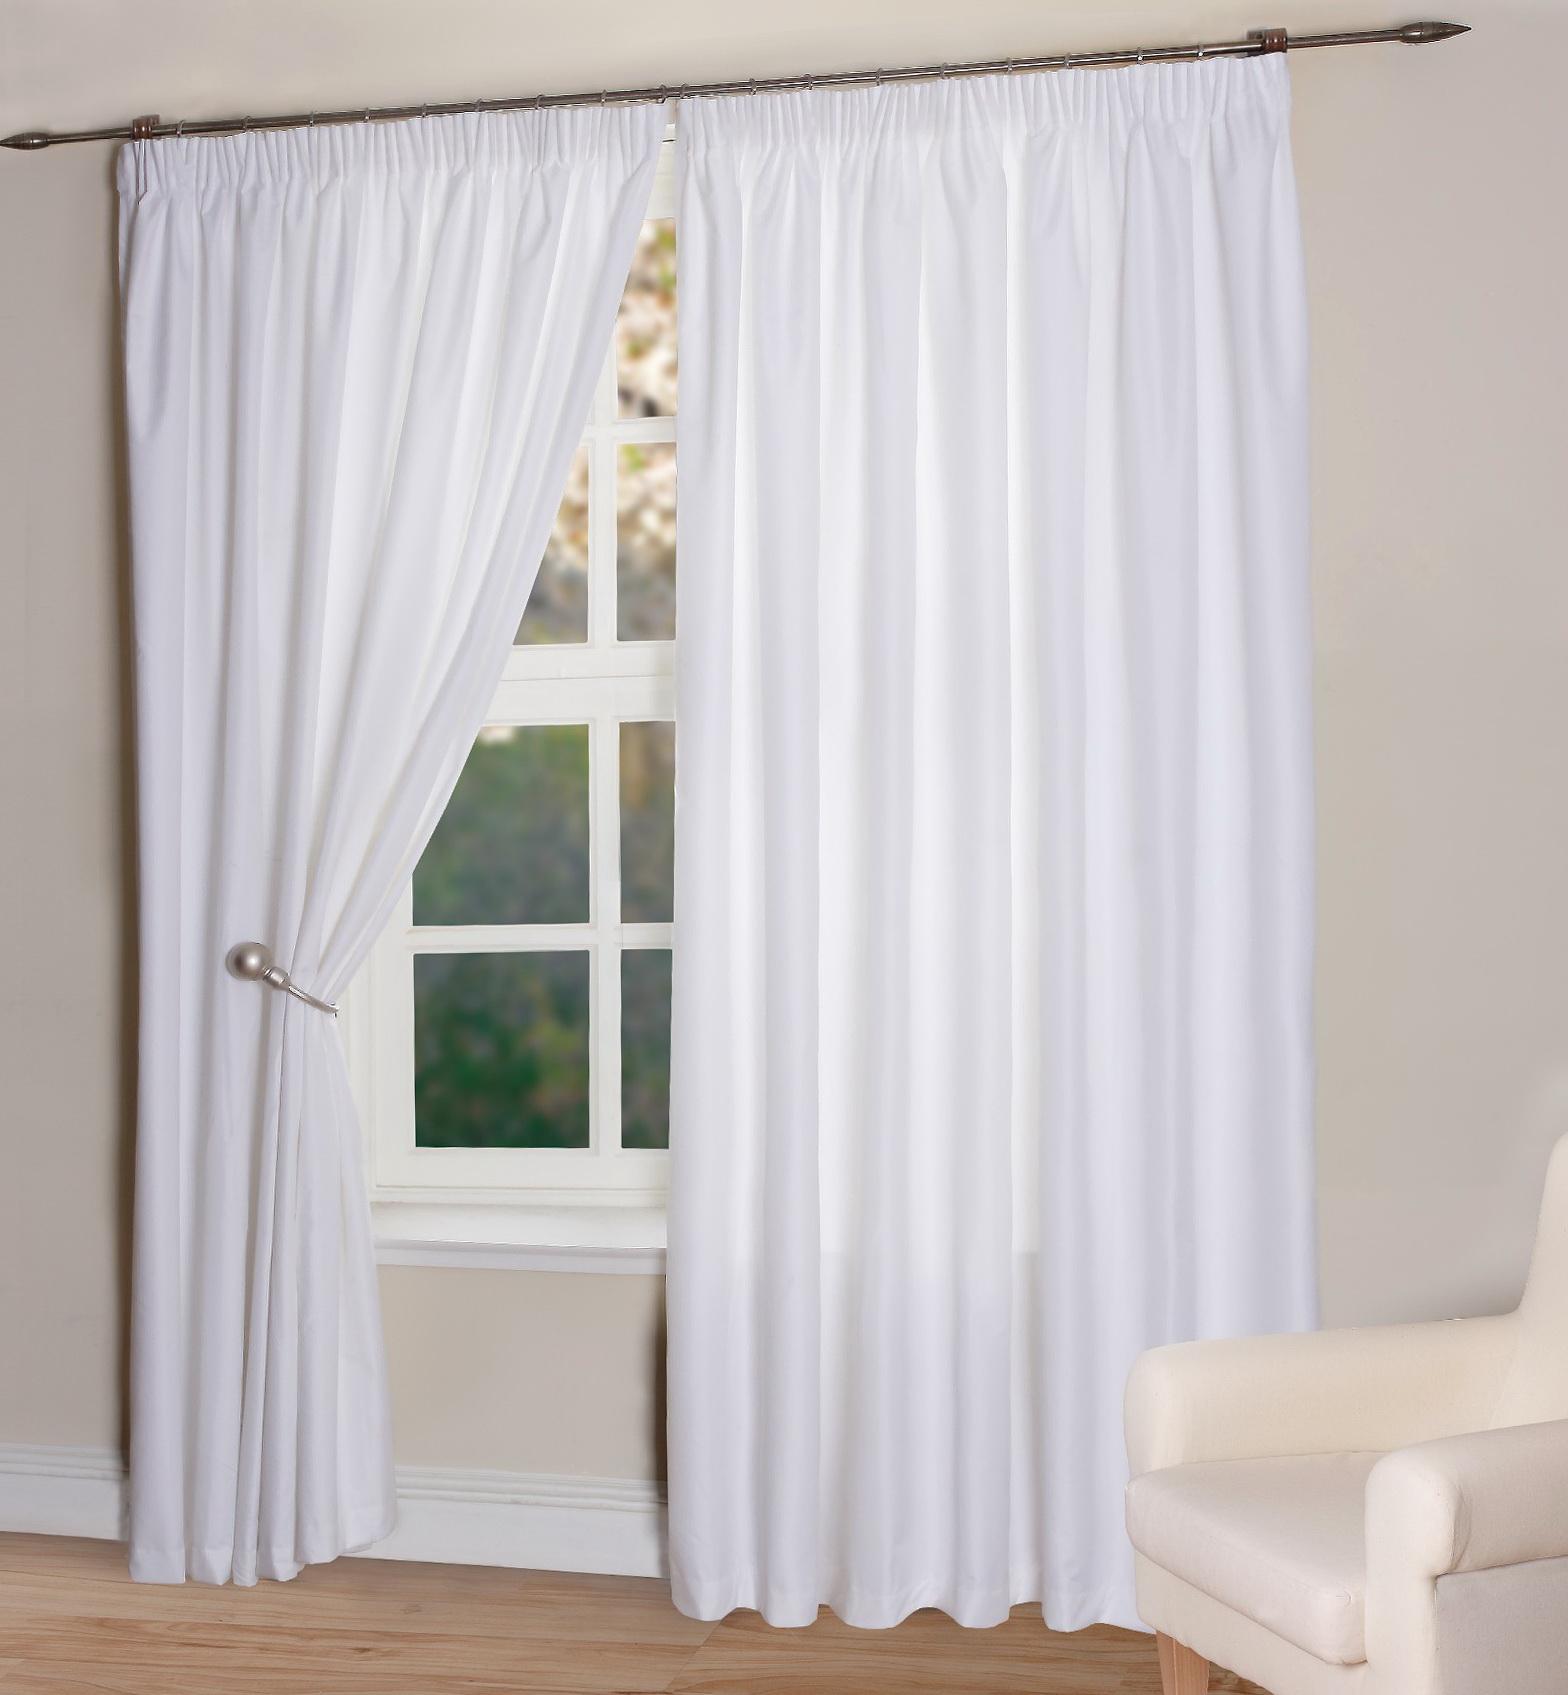 white blackout curtains target home design ideas. Black Bedroom Furniture Sets. Home Design Ideas